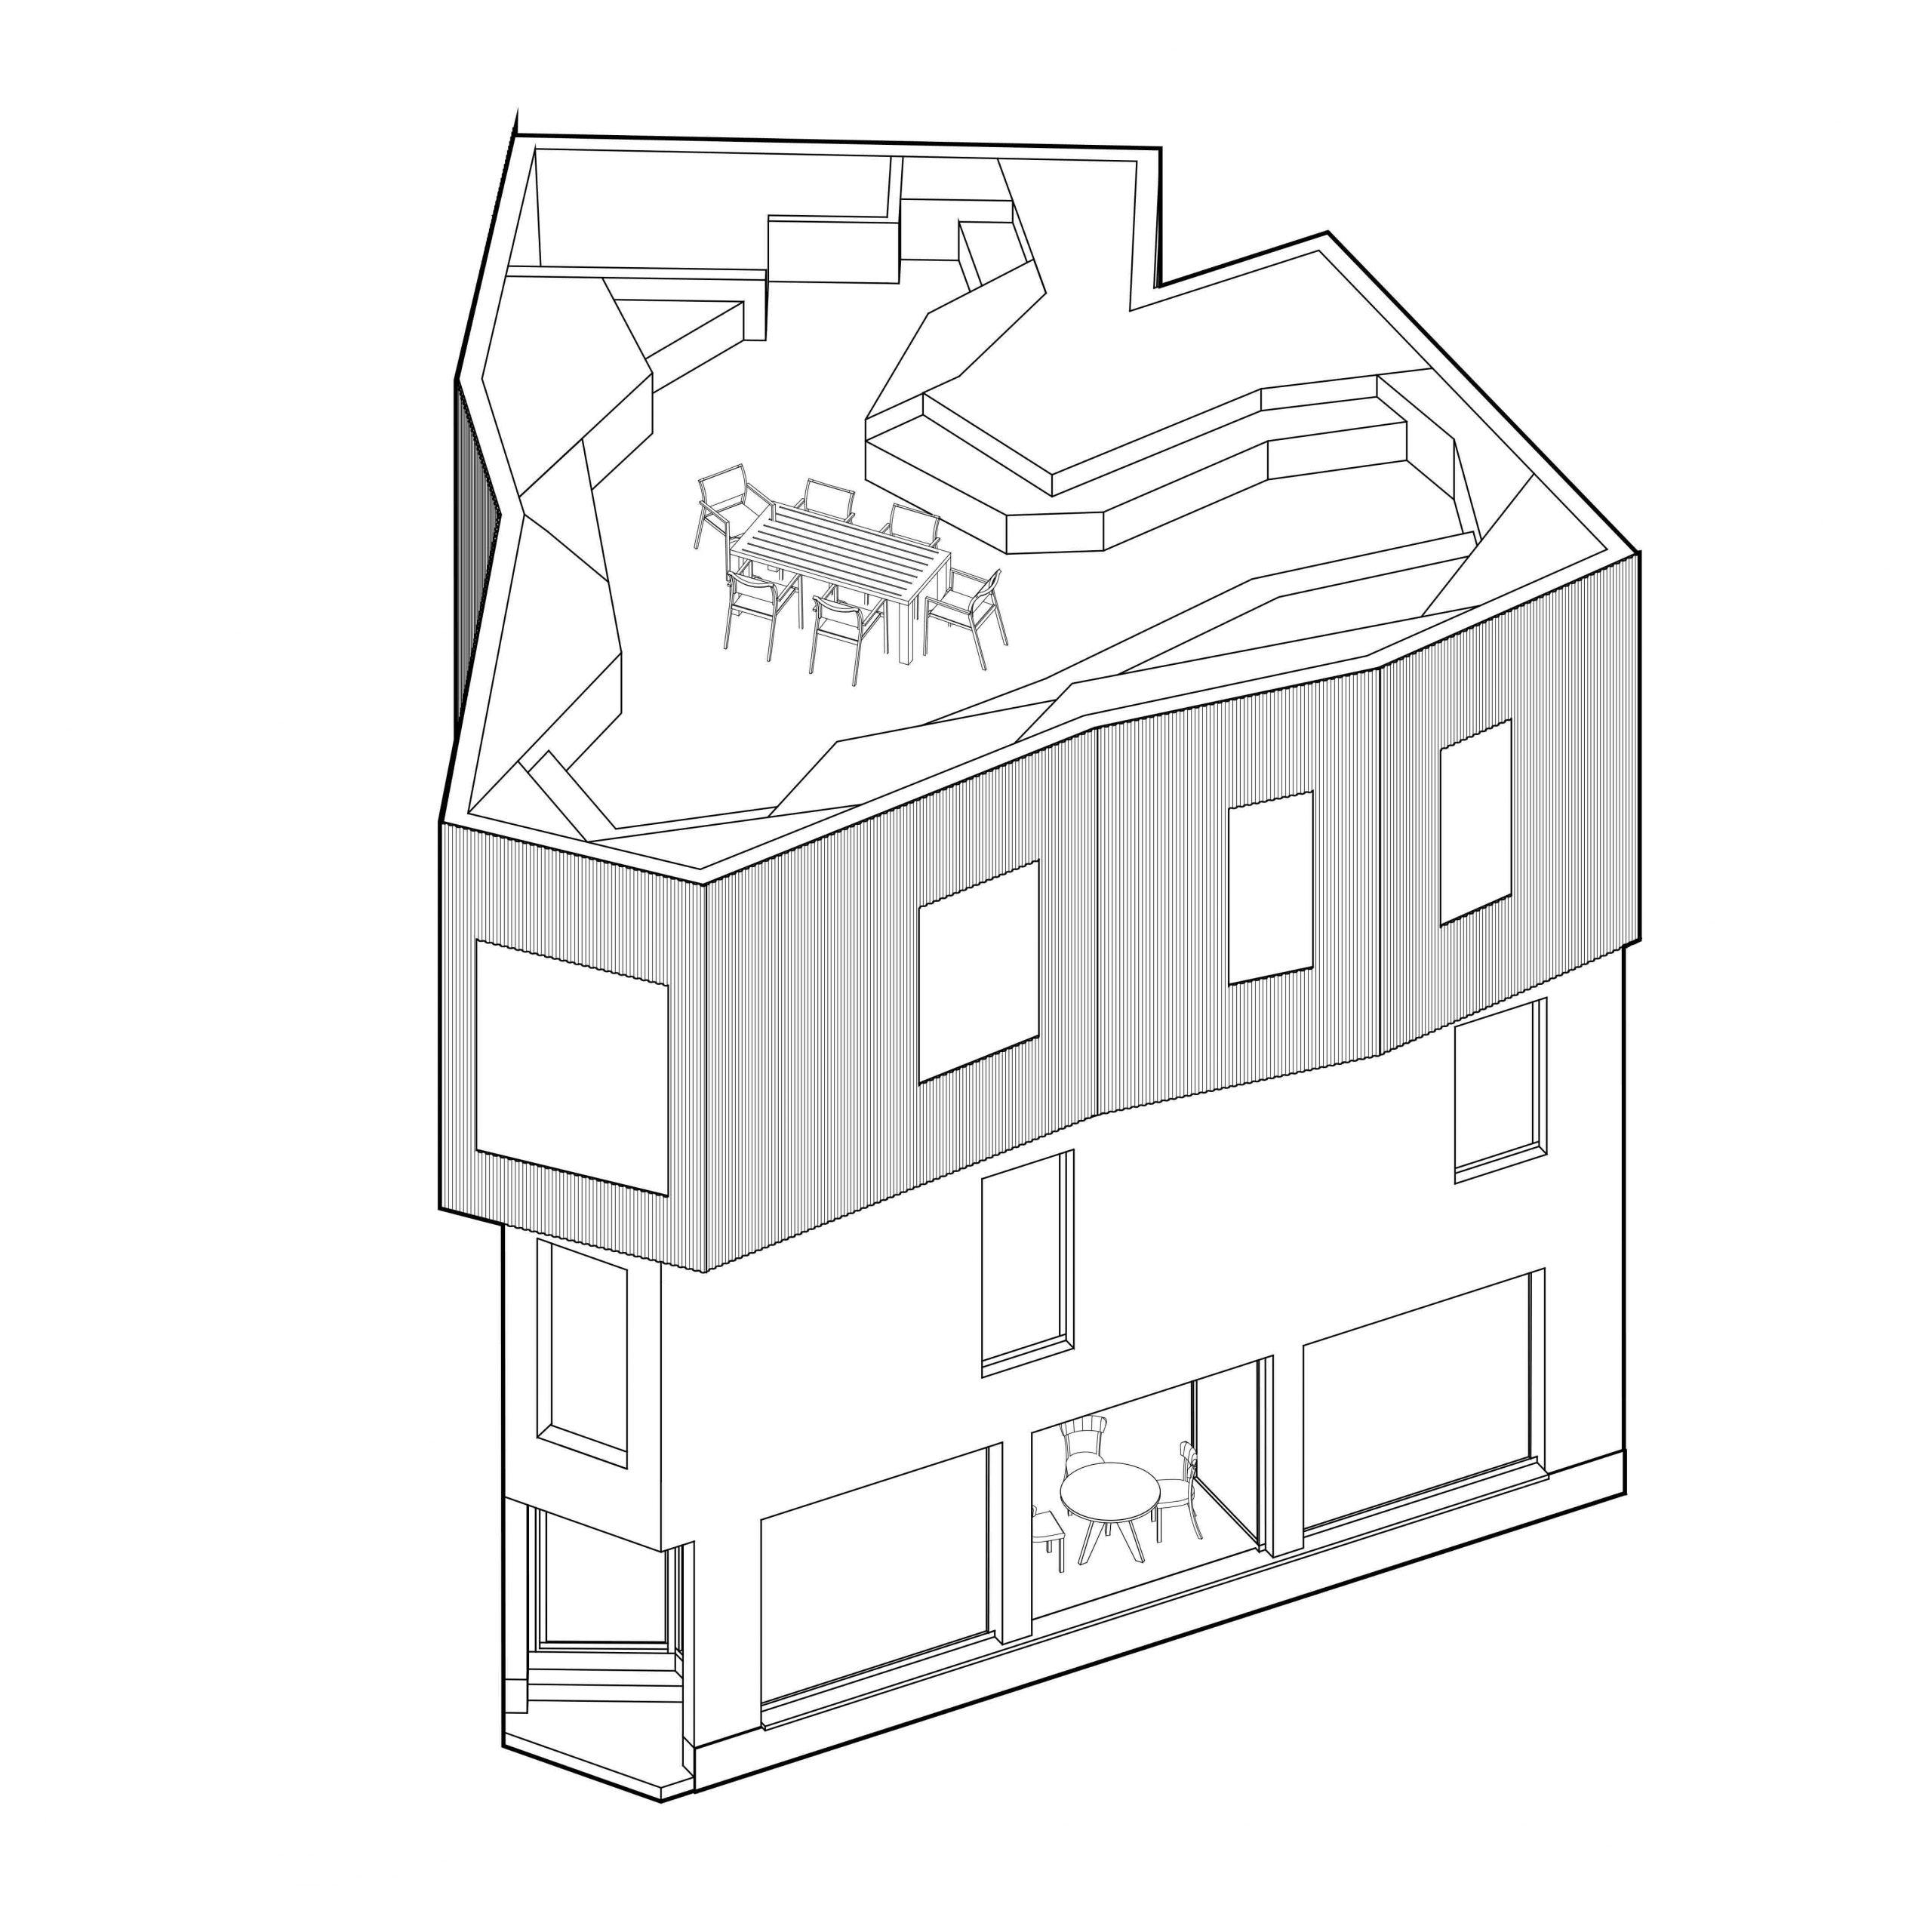 JFASTUDIO - Cornerbuilding